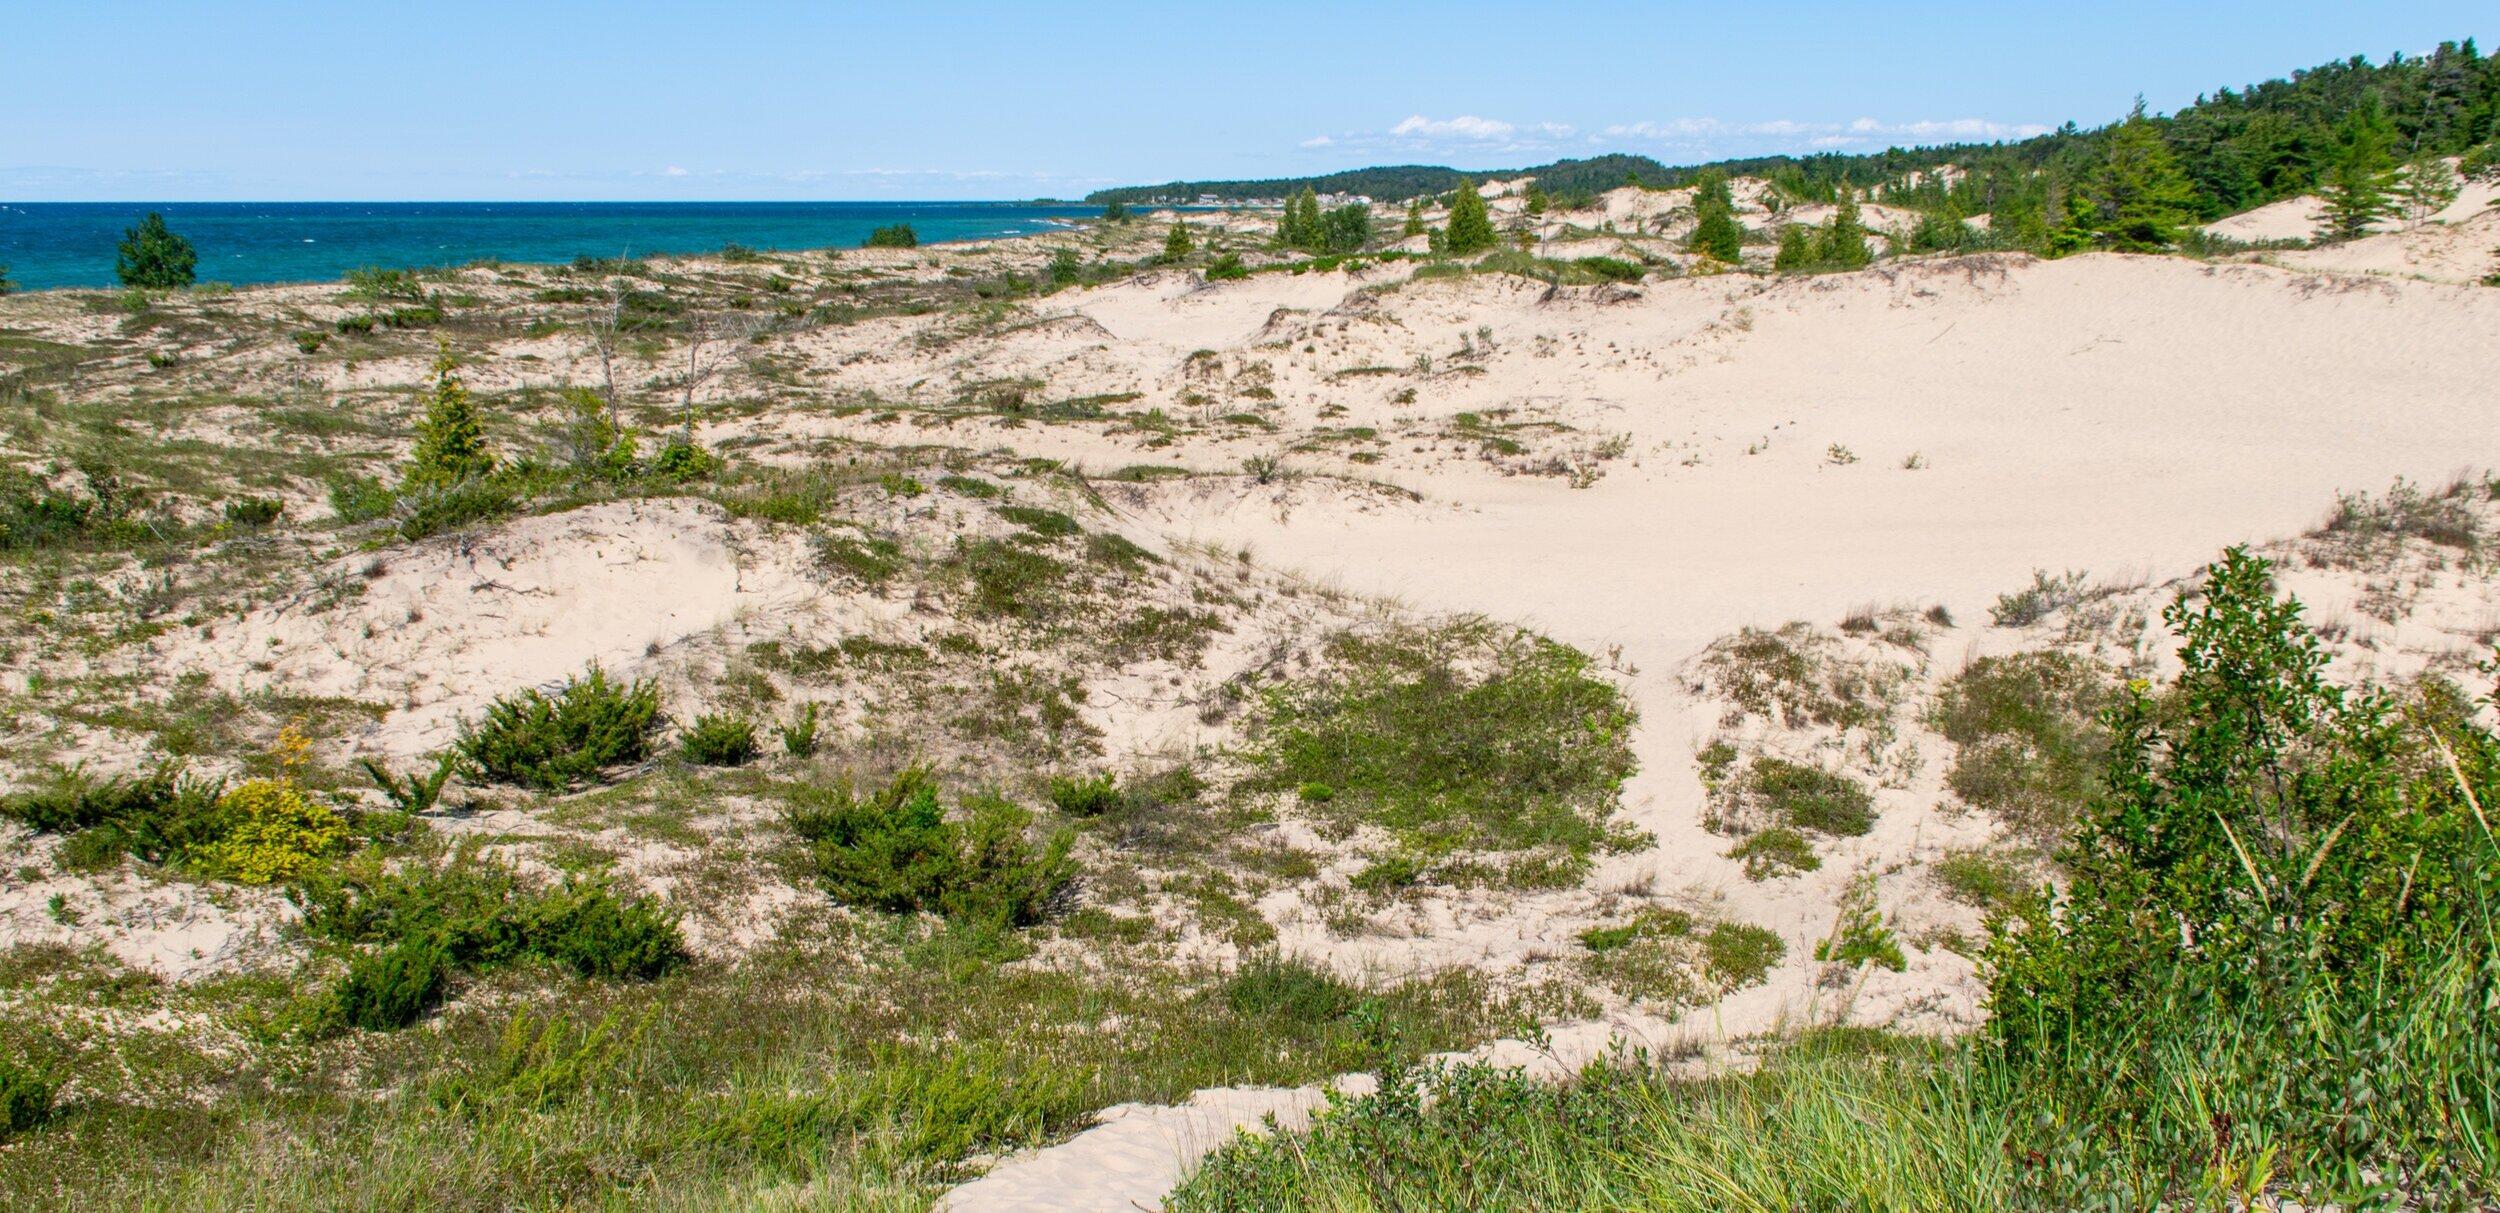 Dunes at the Leelanau State Park on cathead bay